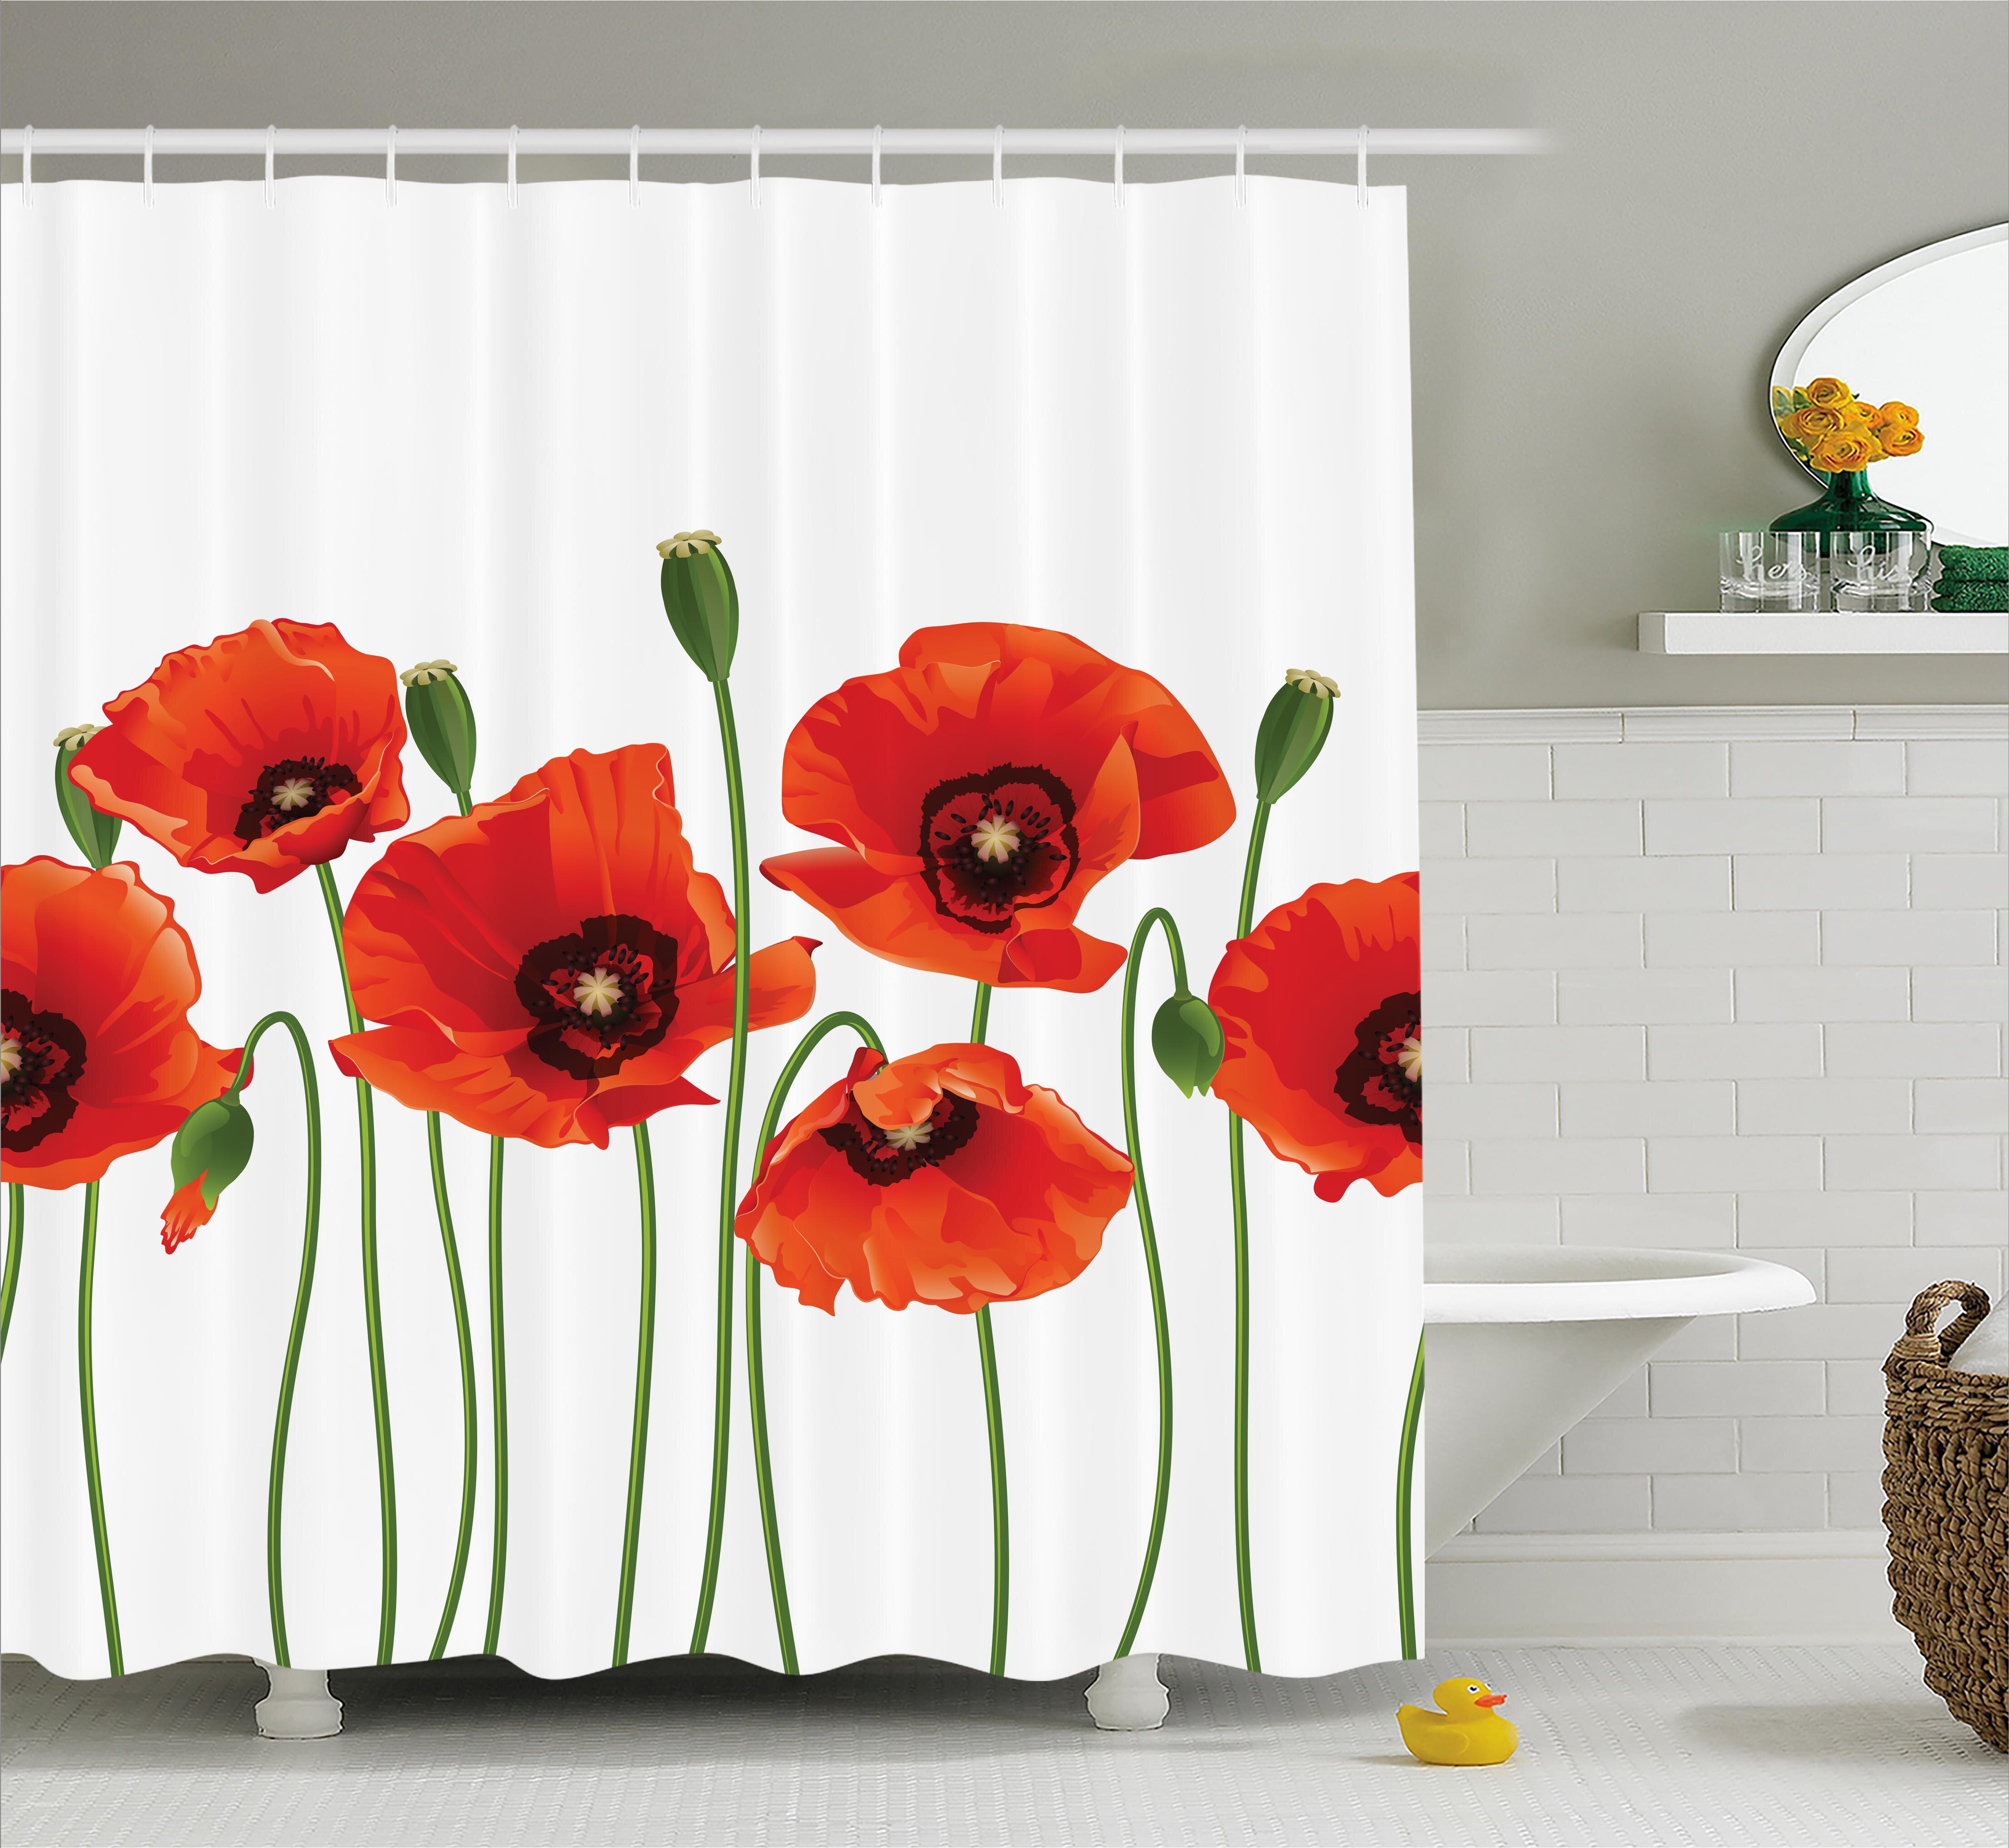 East Urban Home Spring Season Flowers Shower Curtain & Reviews ...